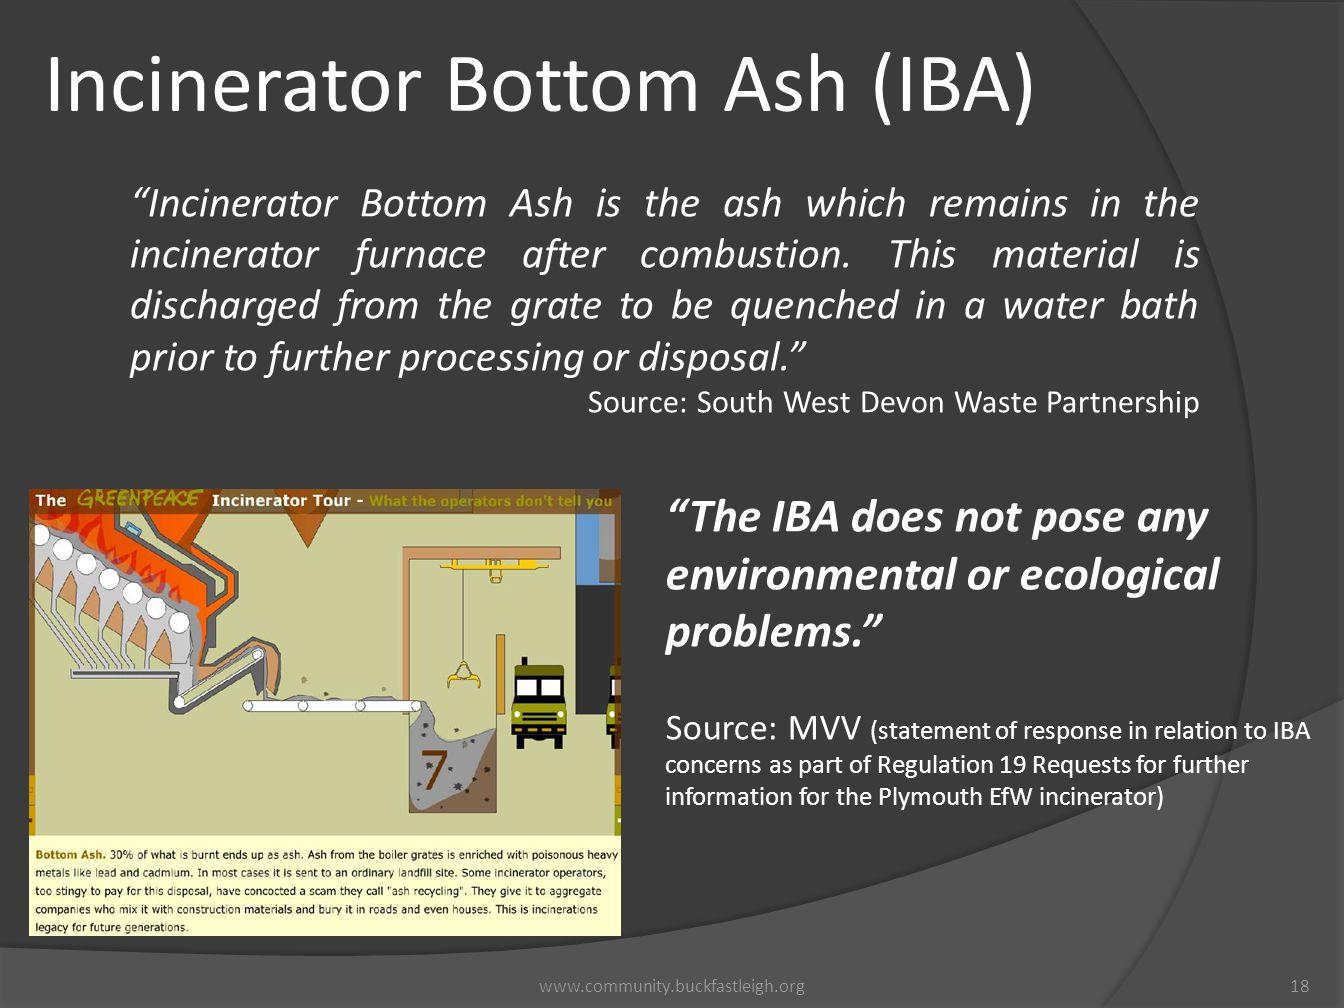 Incinerator Bottom Ash (IBA)